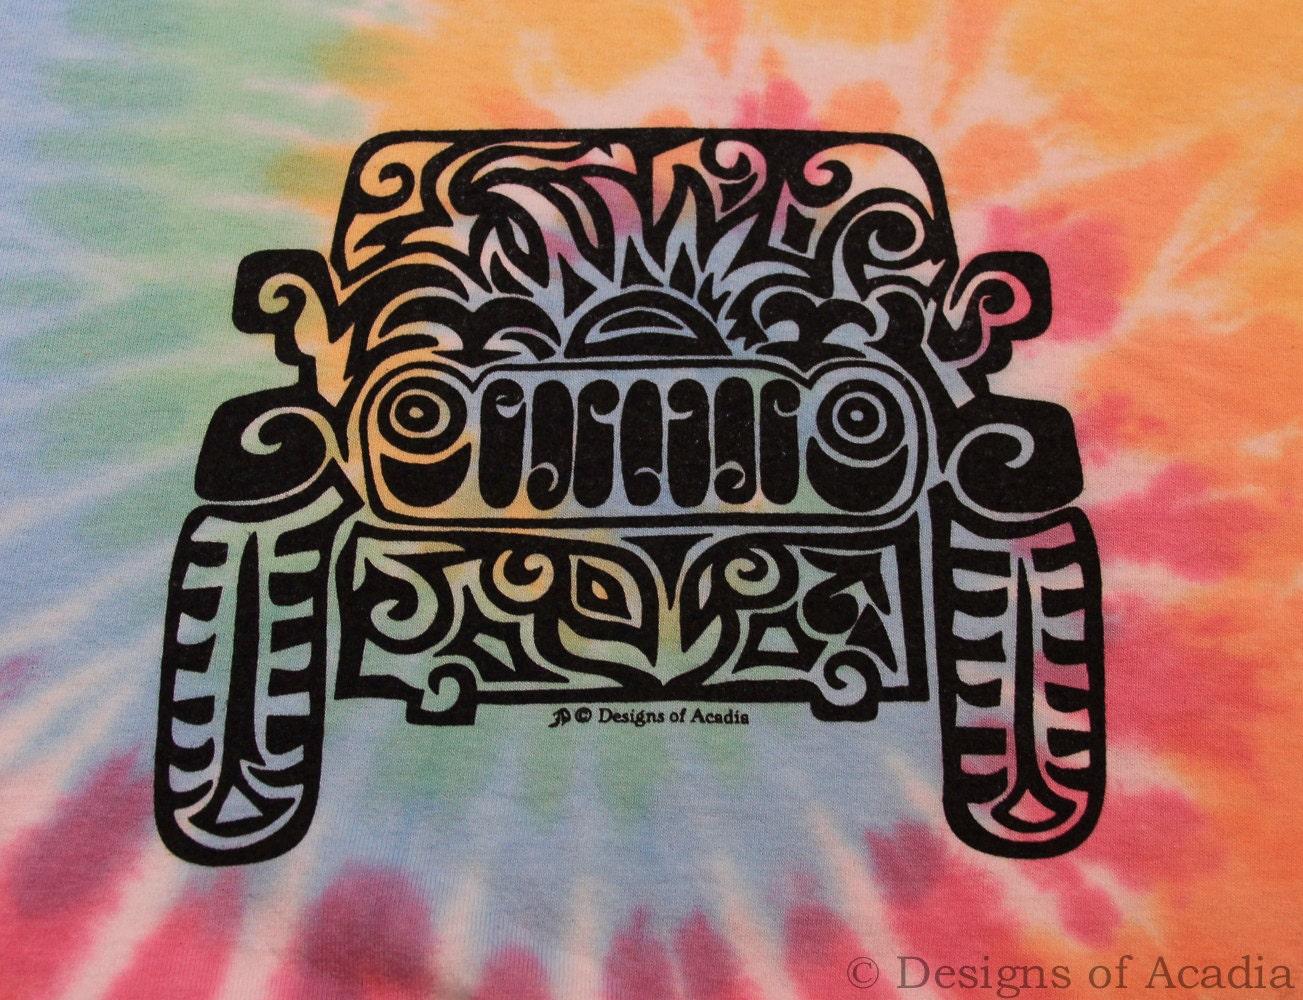 jeep tribal tattoo pastel rainbow tie dye ladies v neck t shirt s xl. Black Bedroom Furniture Sets. Home Design Ideas